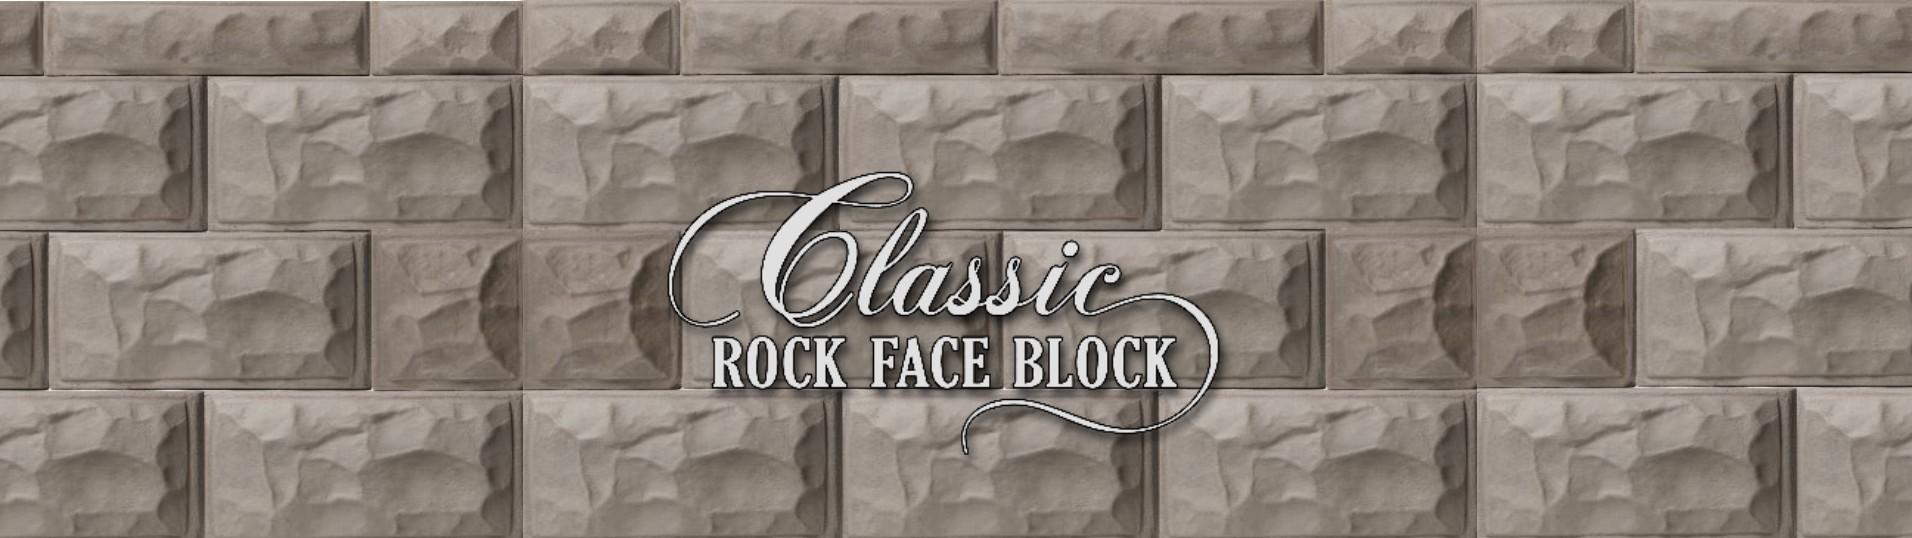 Classic_Rock_Face_Rusticated_Block